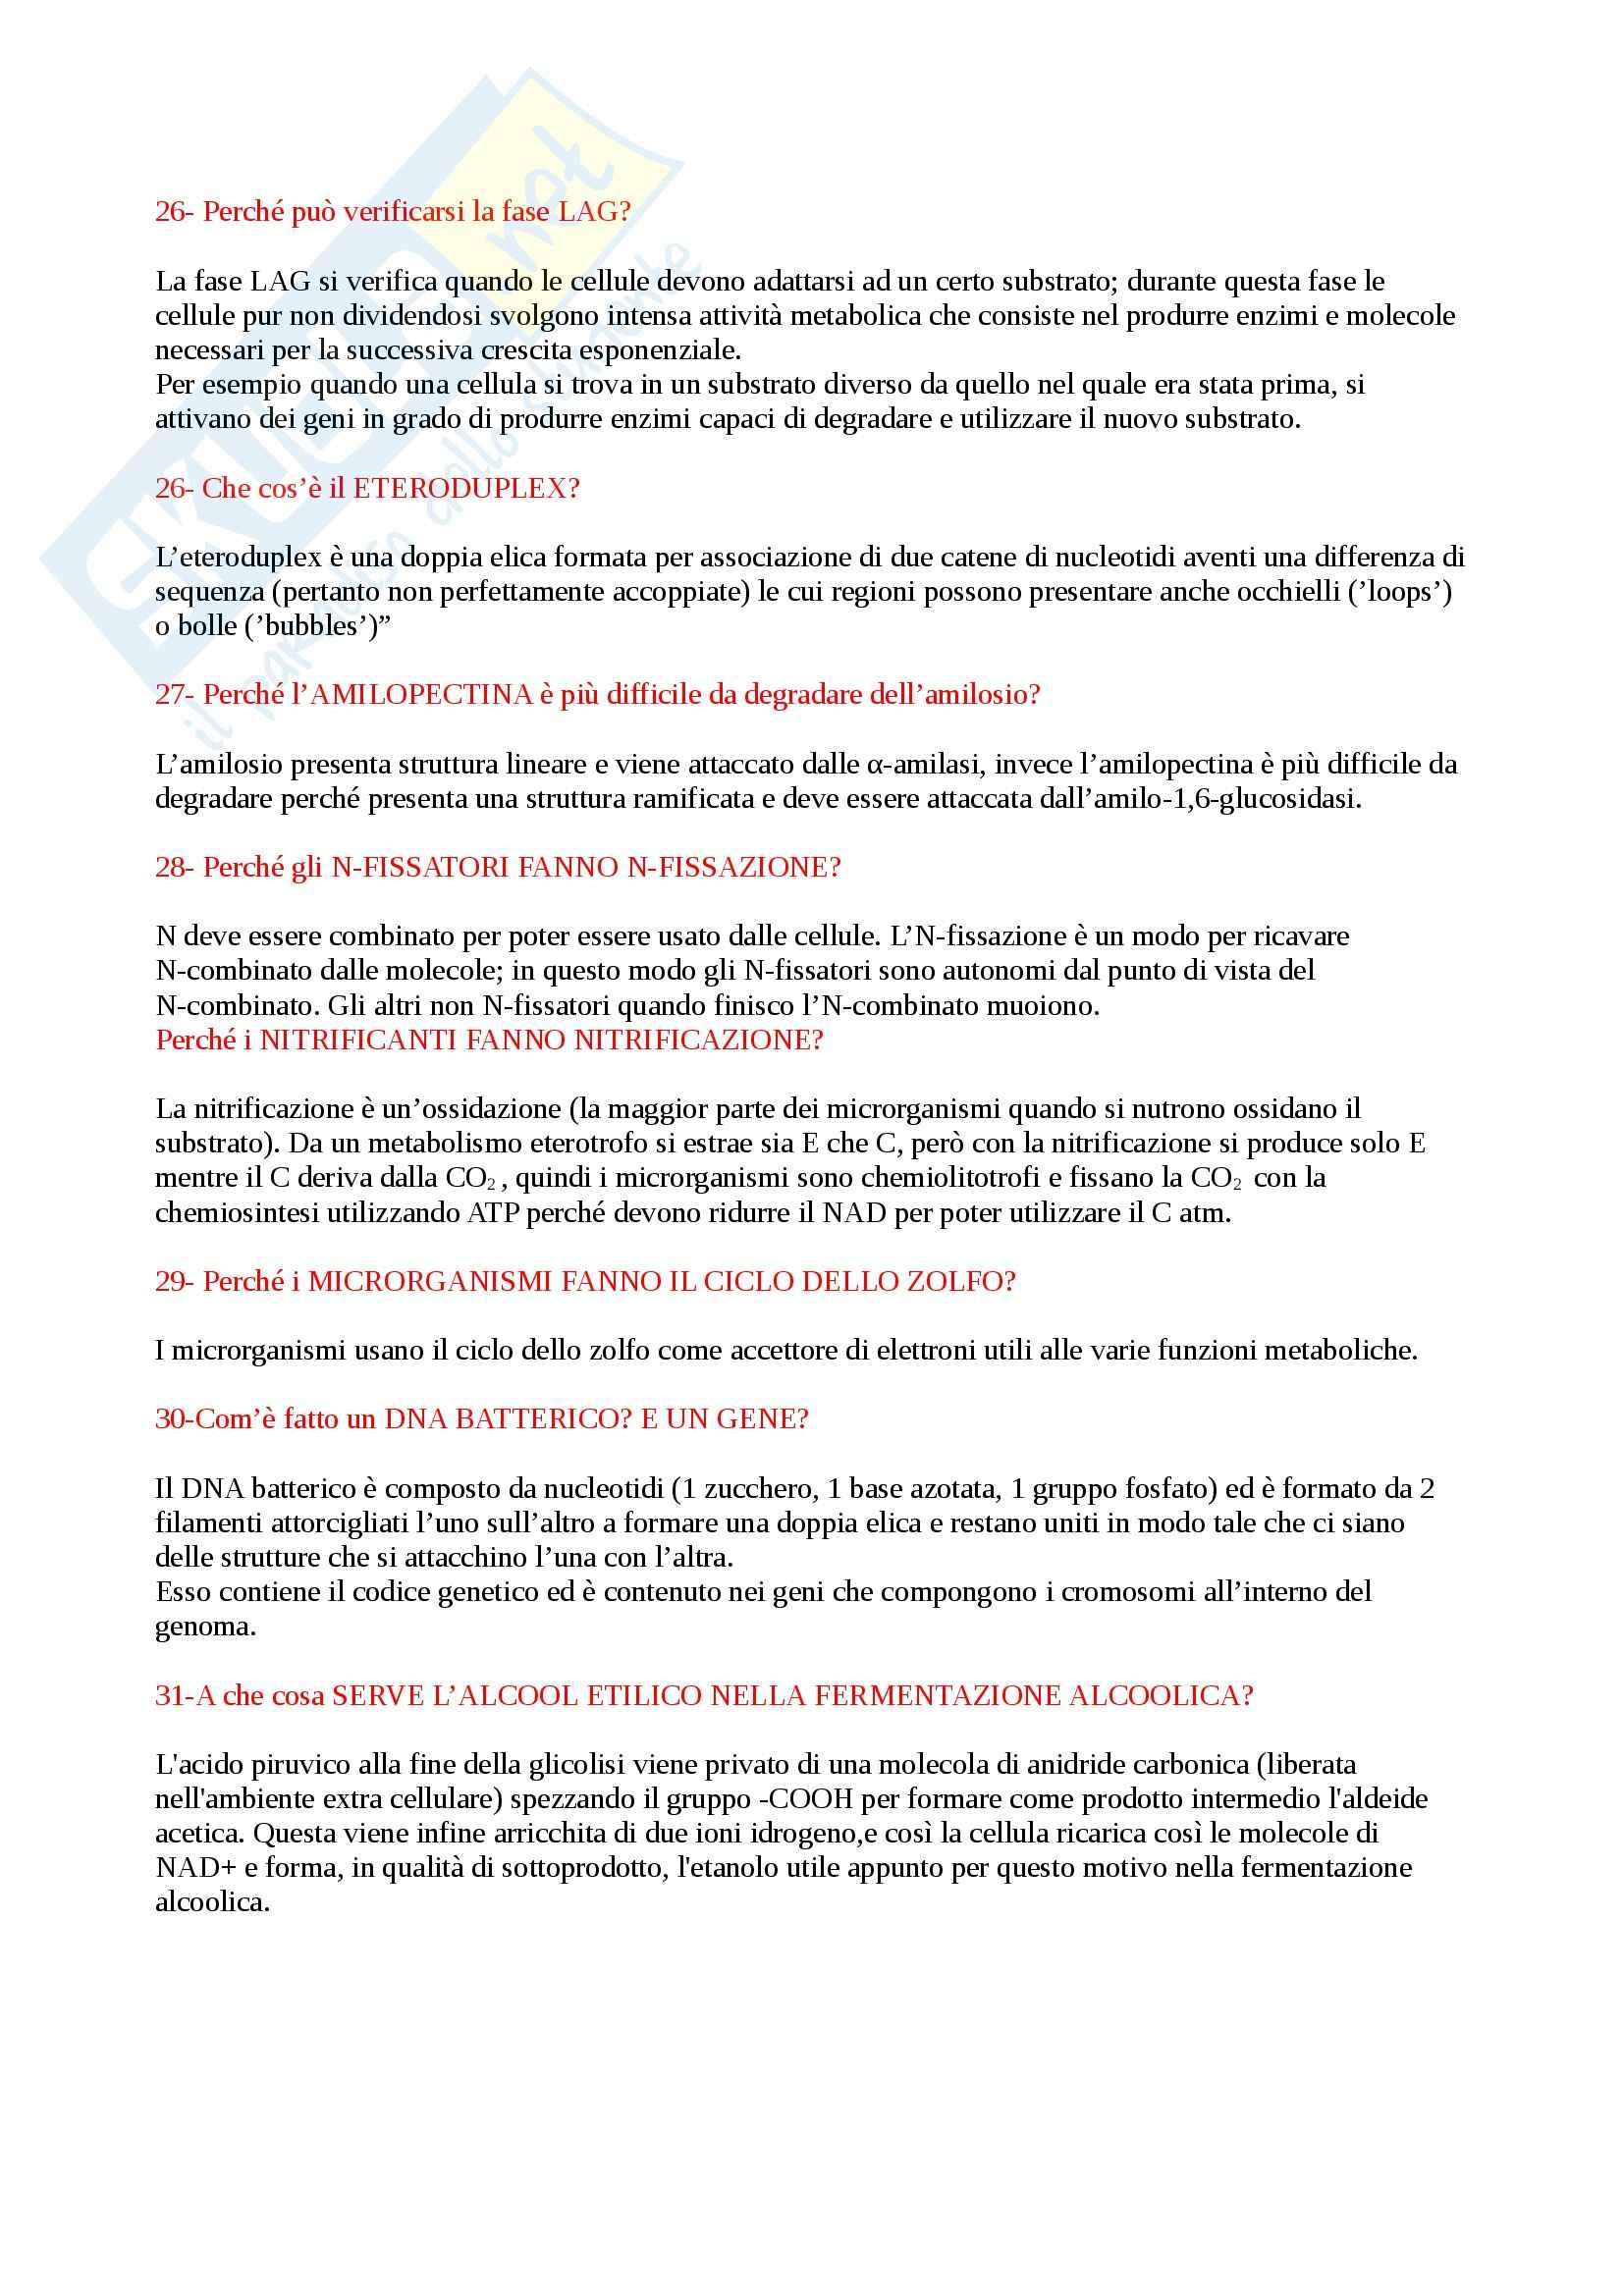 Microbiologia agraria - Domande Pag. 6